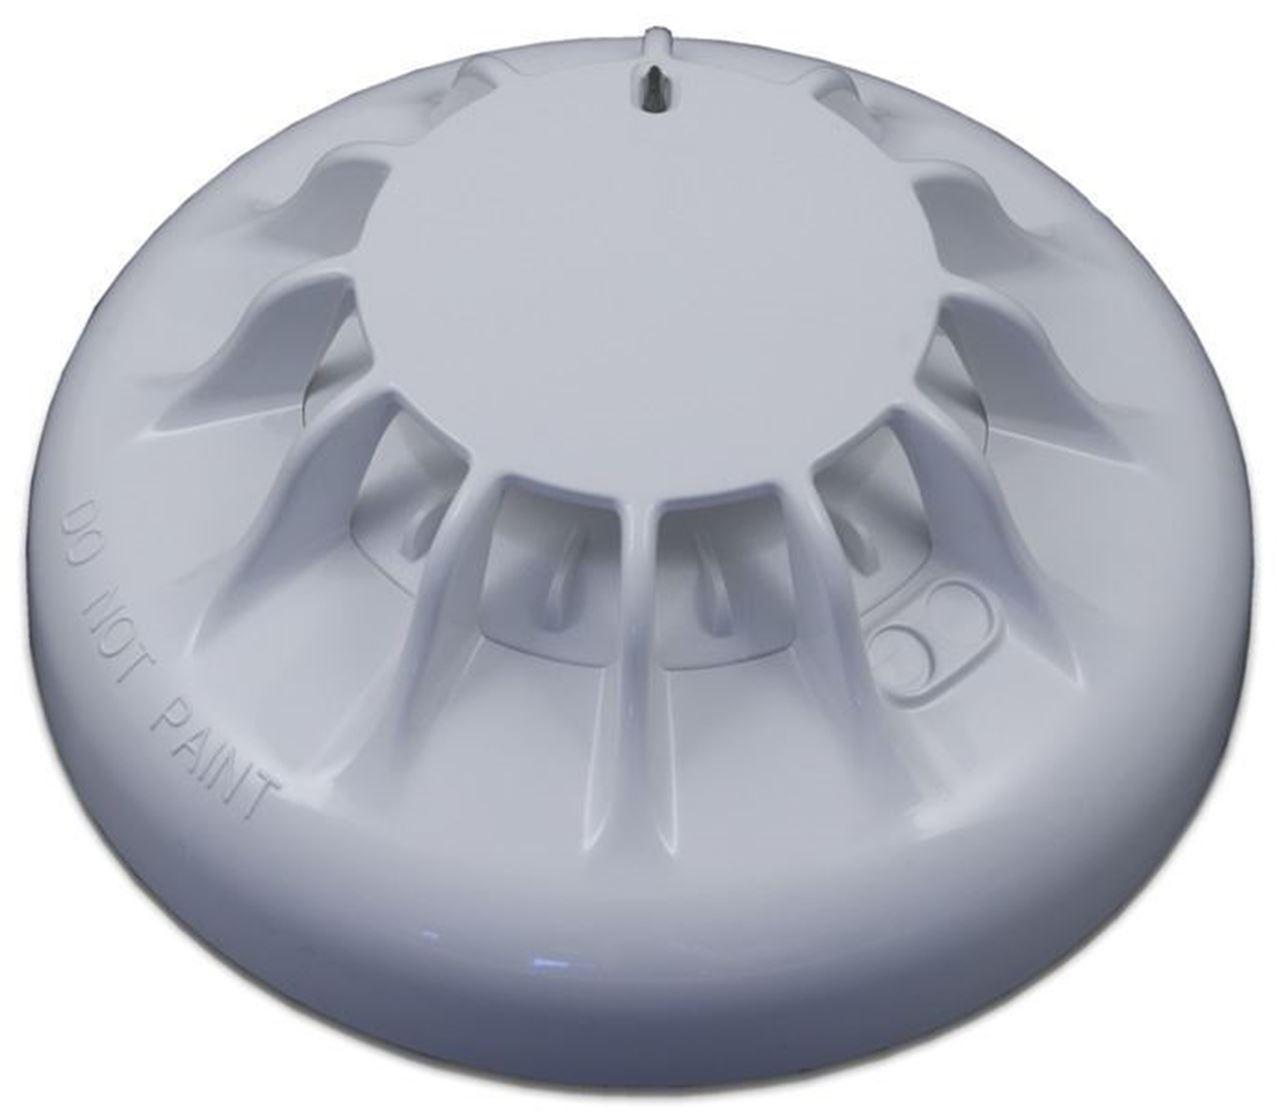 FC460H - Heat Detector Armenia Vantag